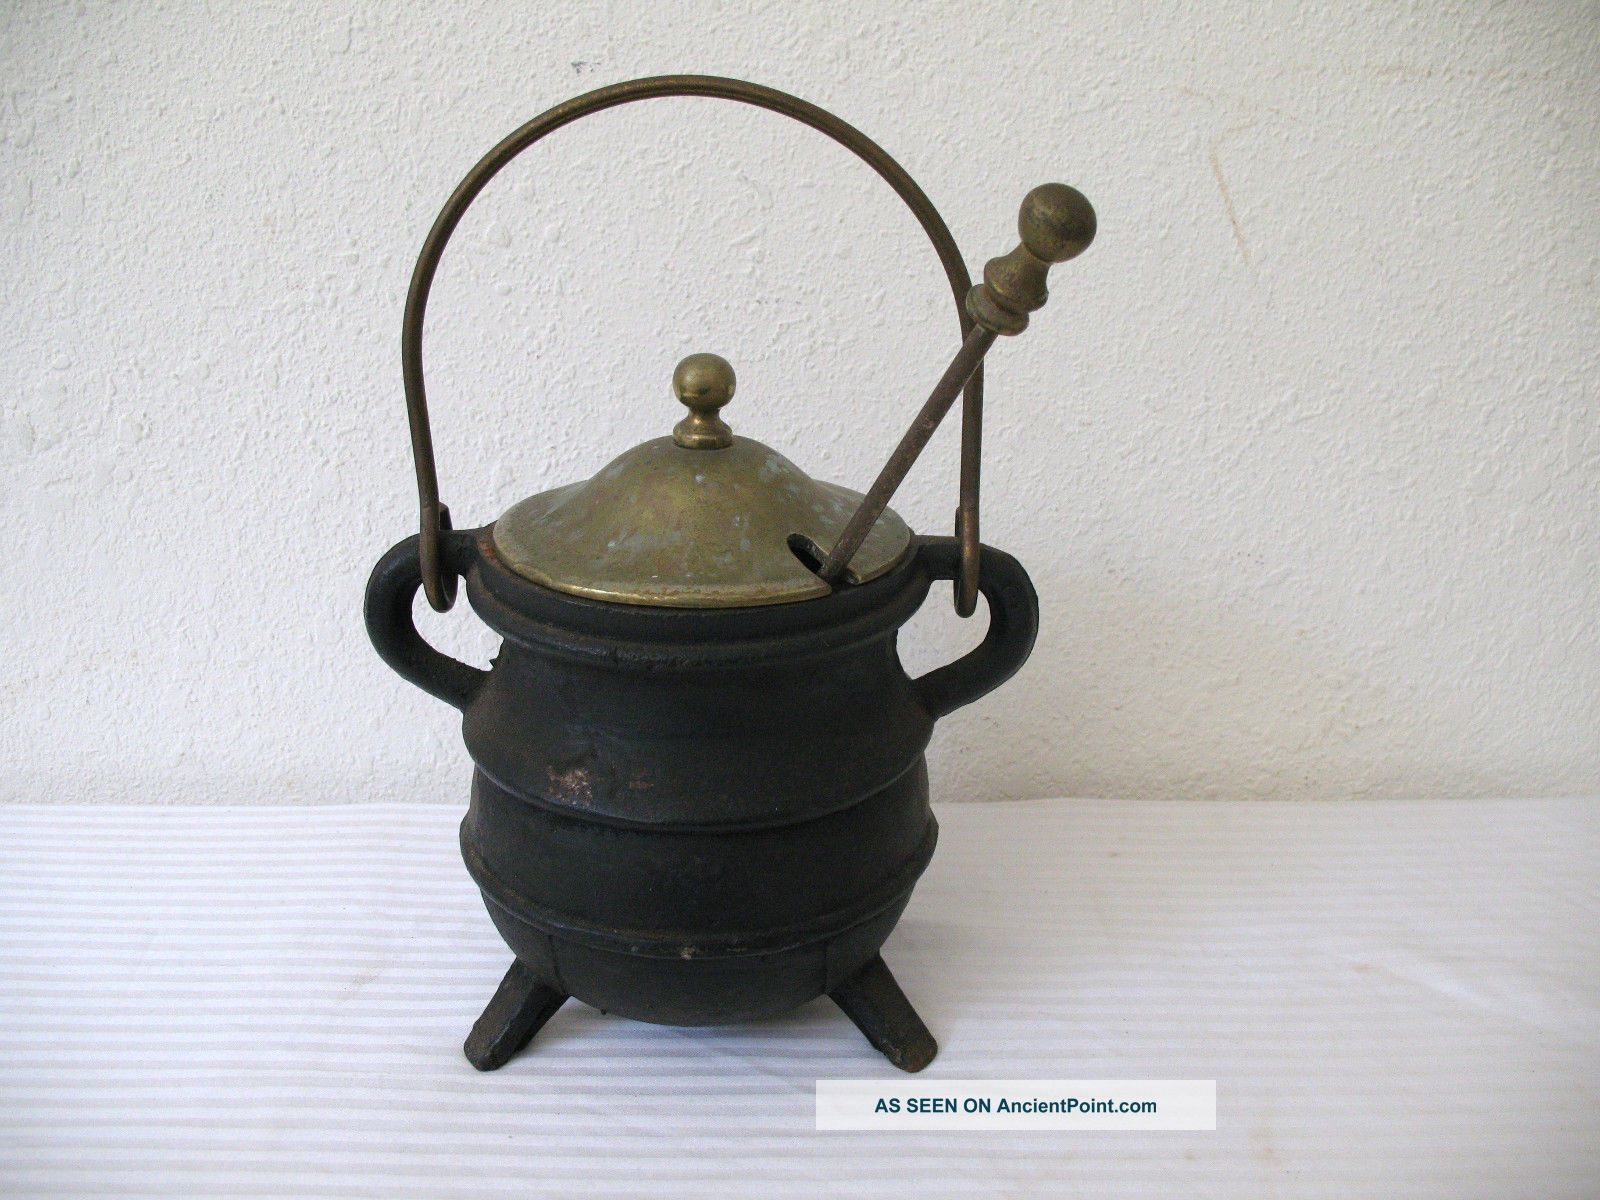 Cast Iron Fire Starter Smudge Pot Antique 3 Leg Brass Handle Lid Wand Pumice Hearth Ware photo